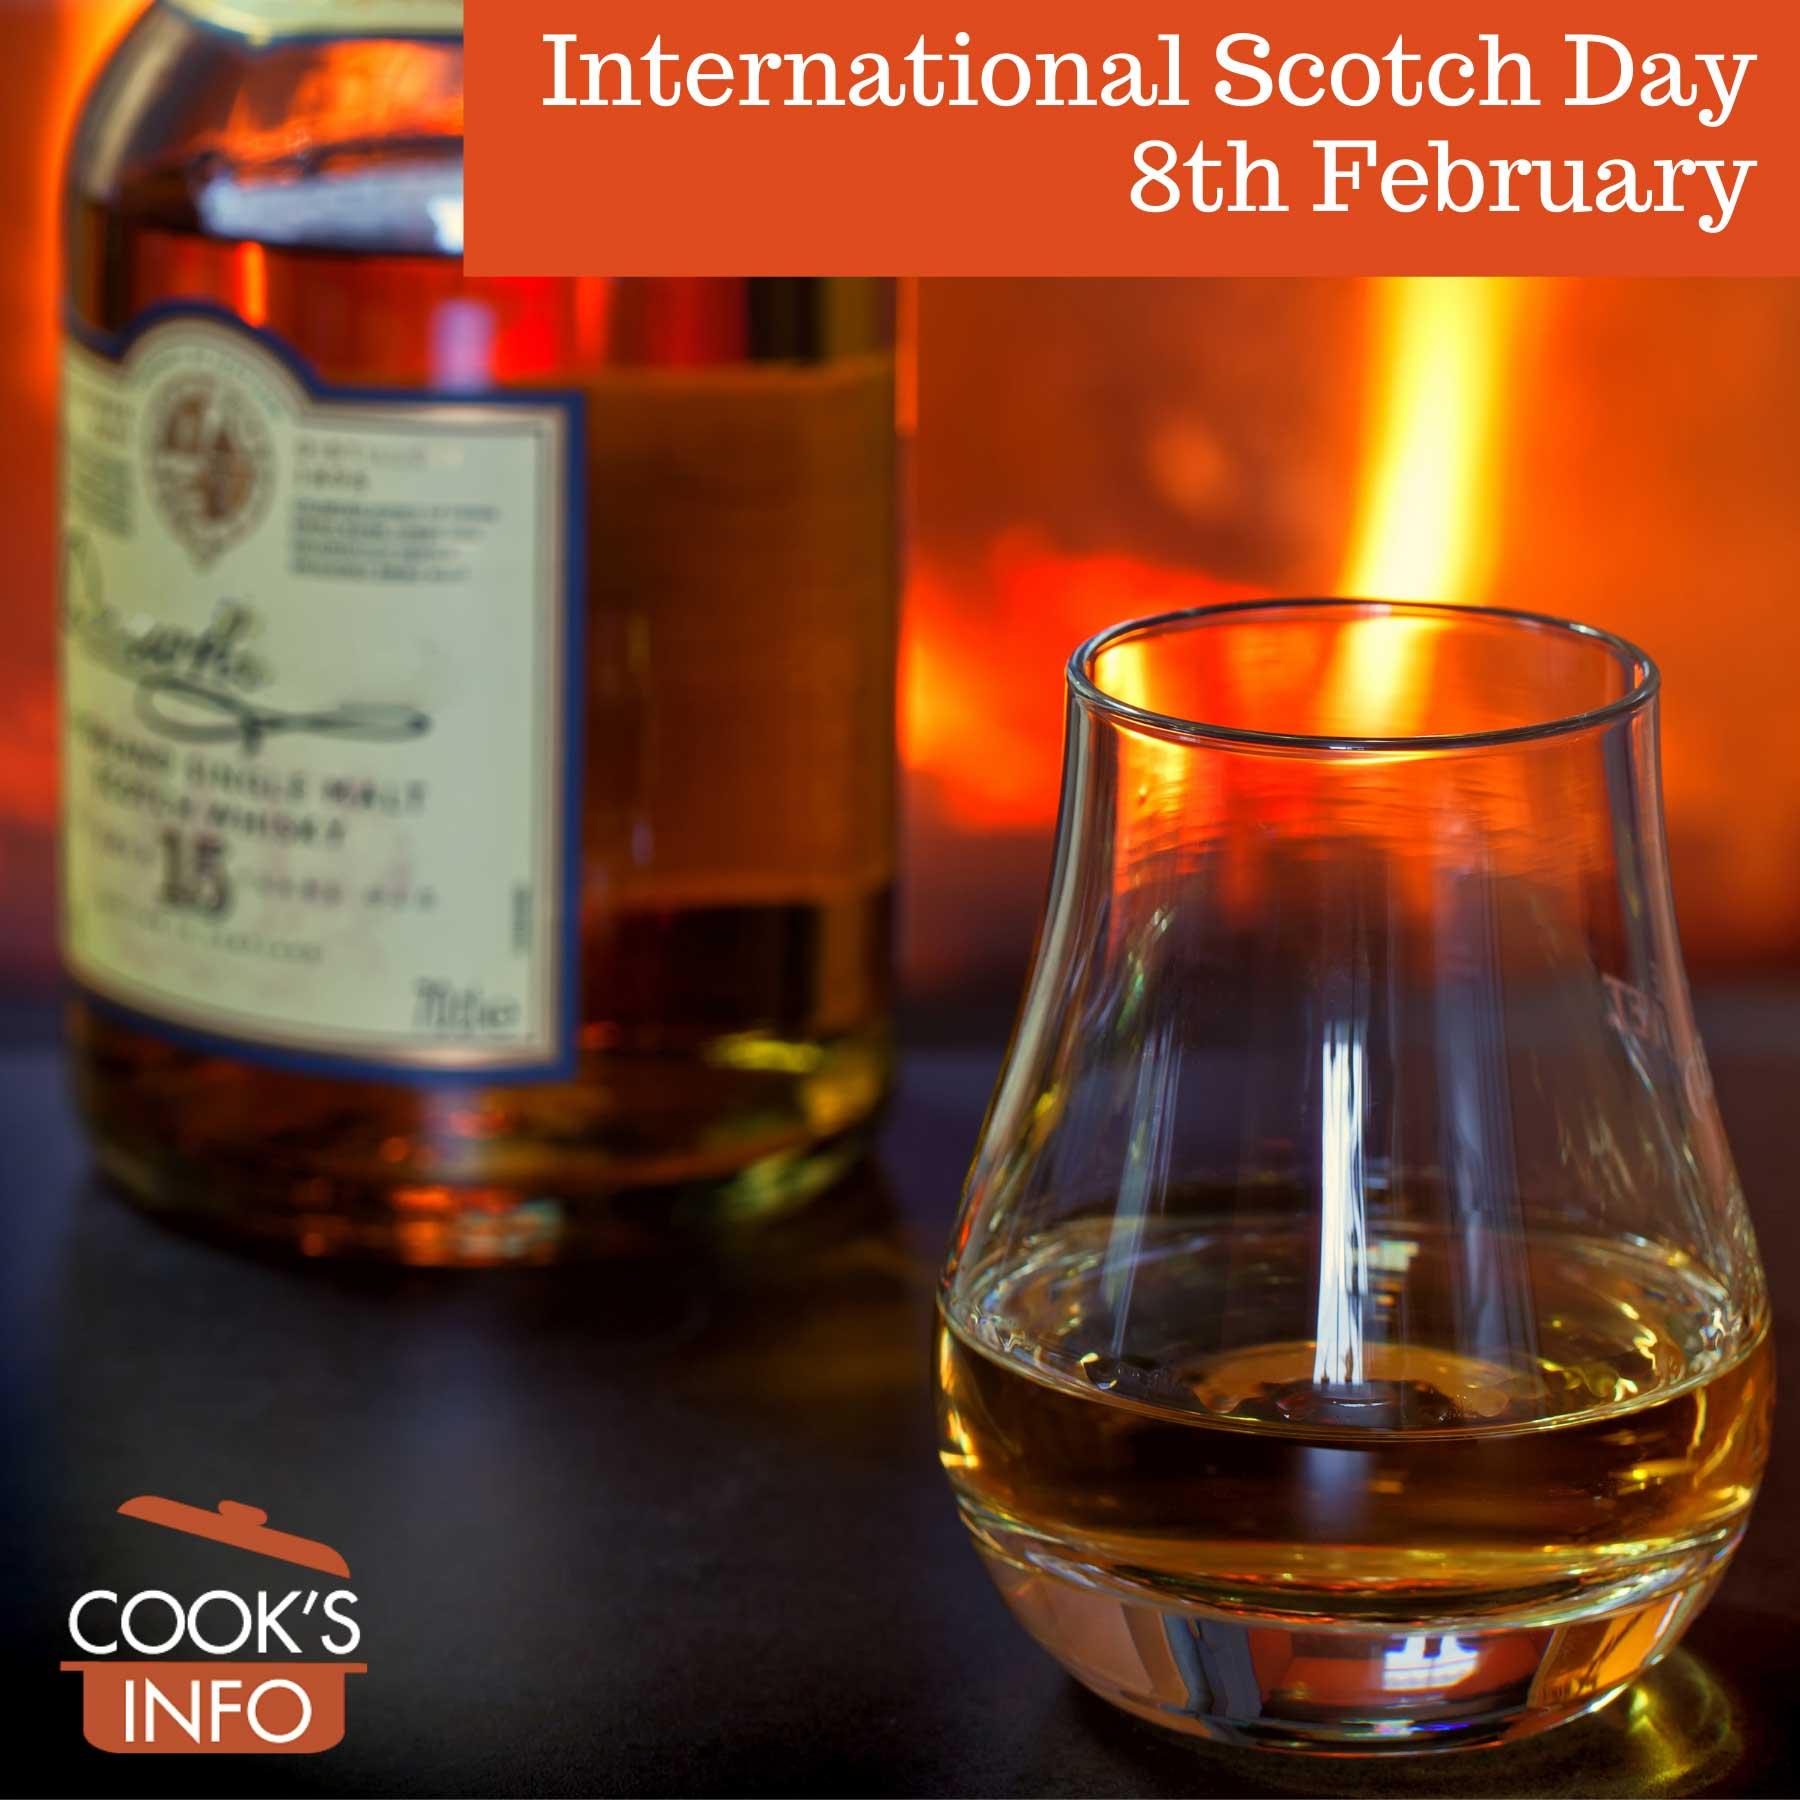 Glass of scotch